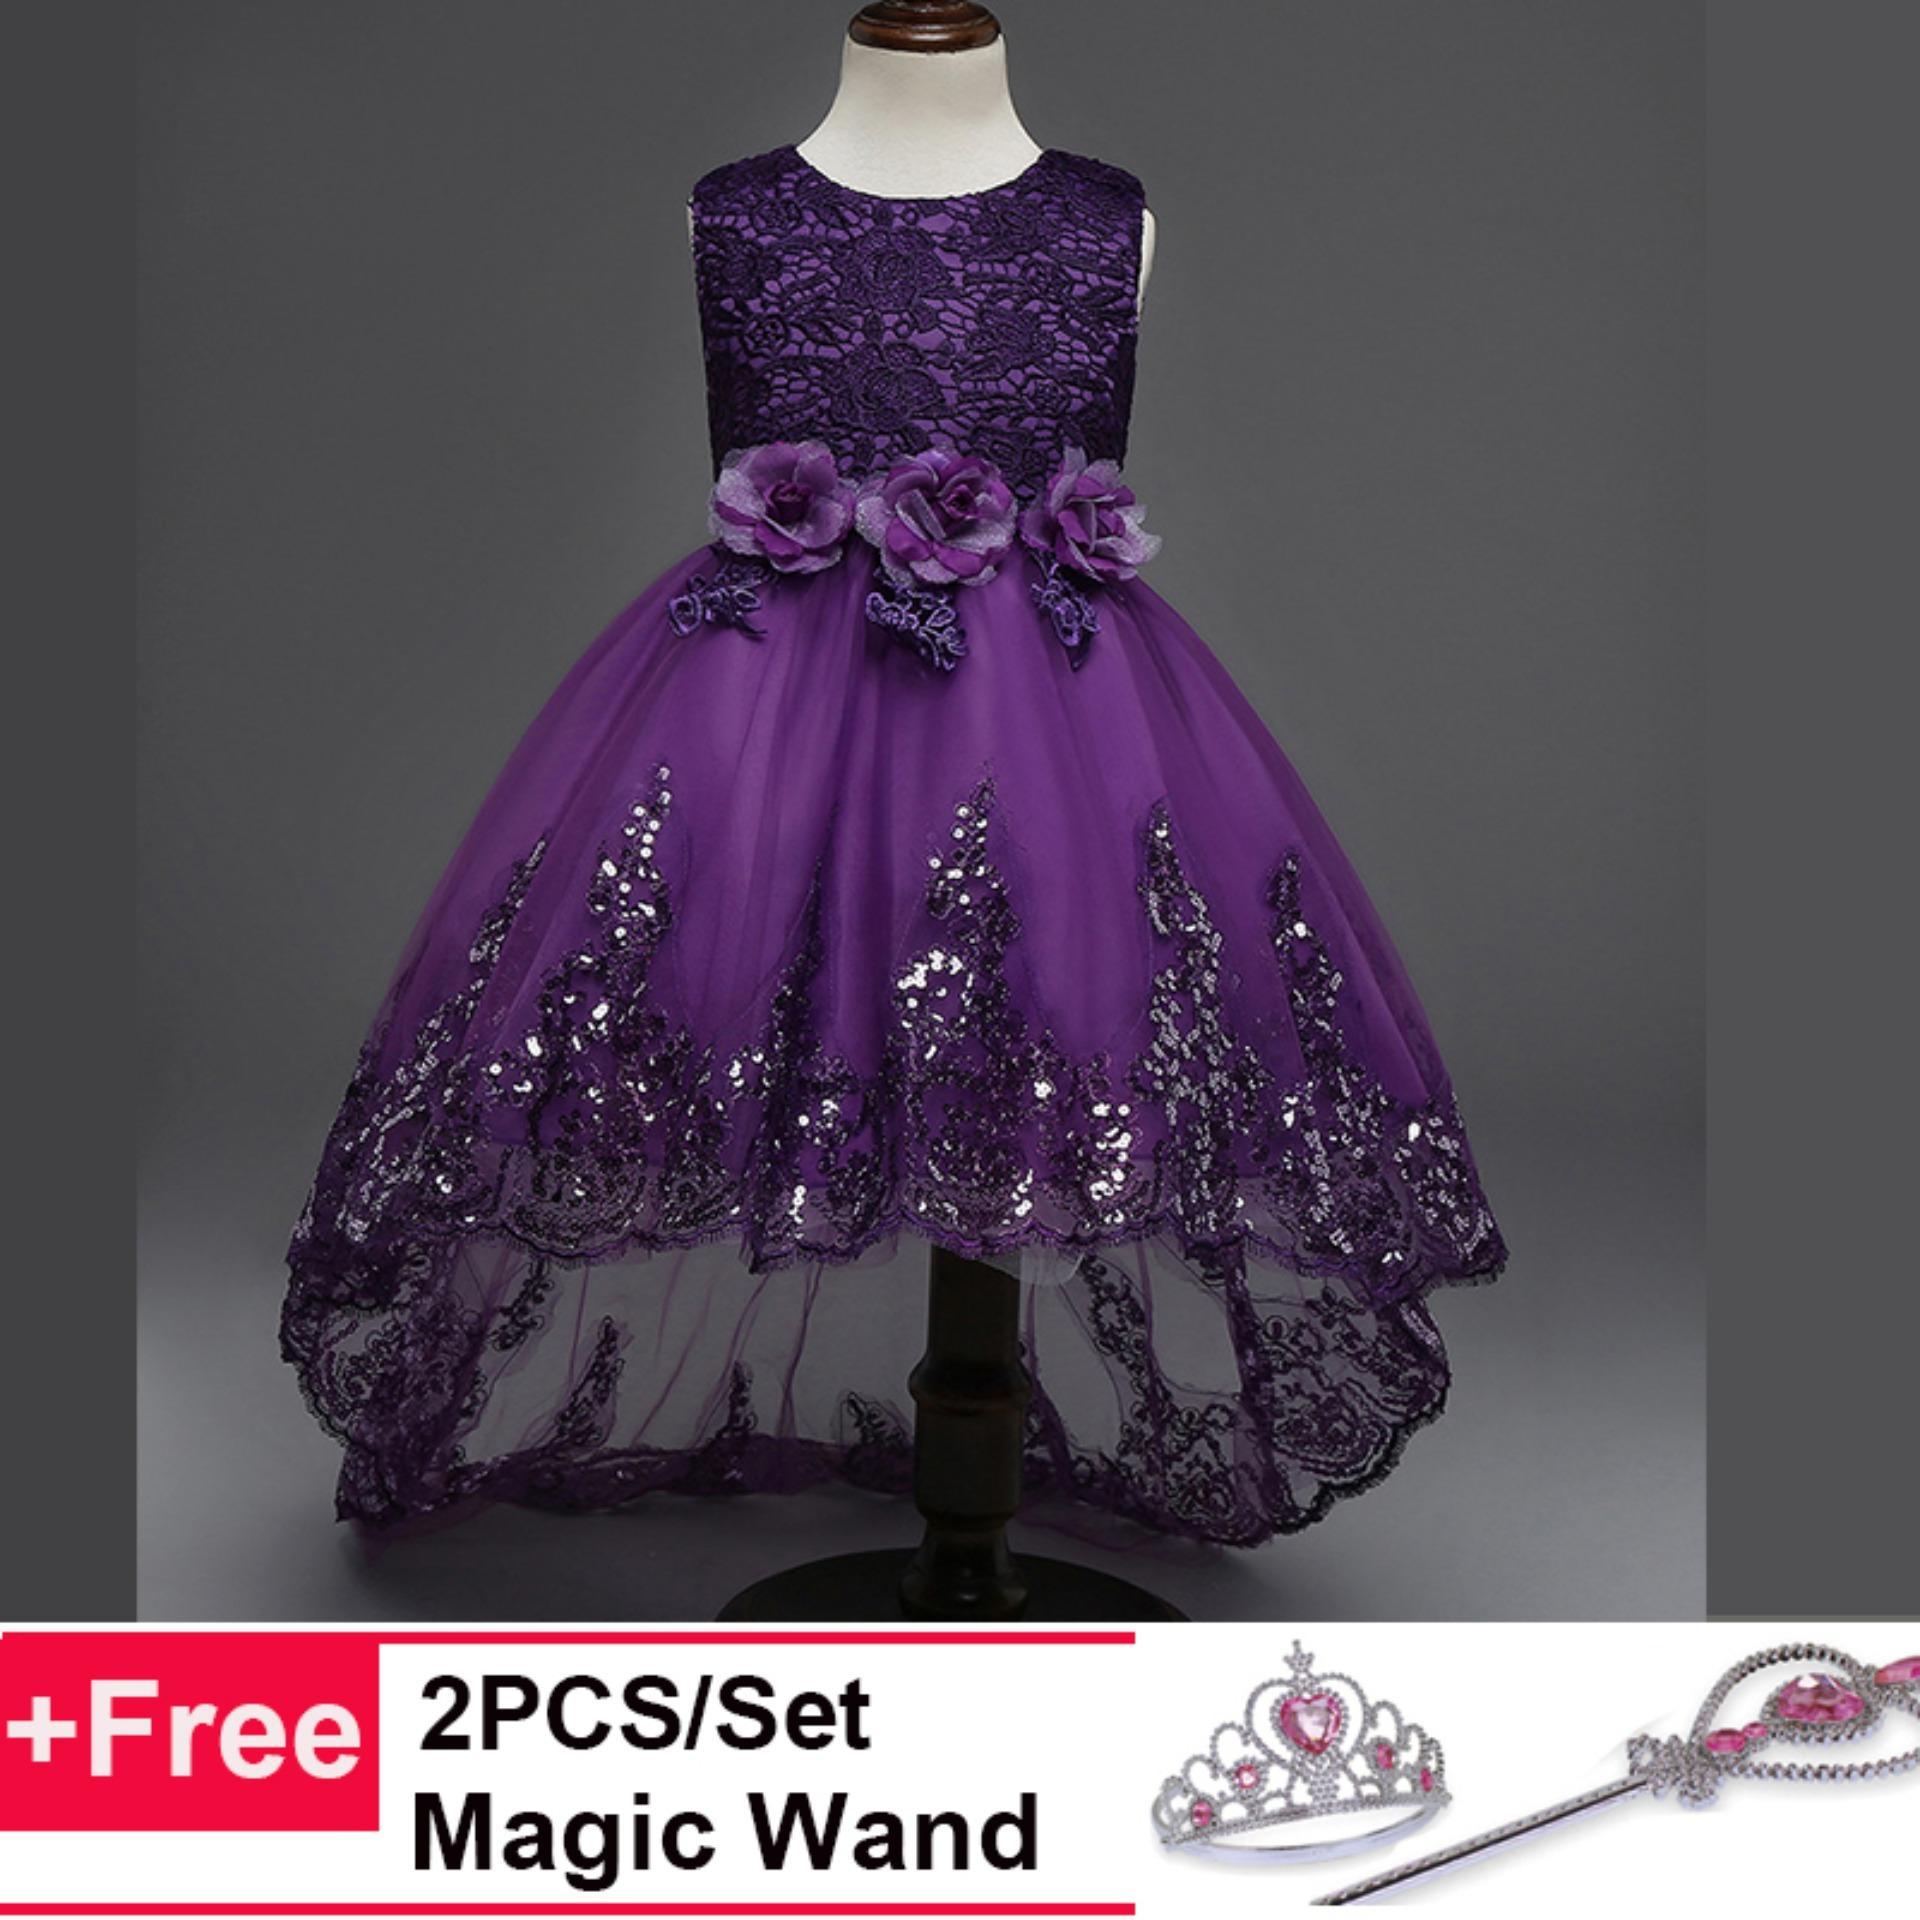 Gadis Bunga Putri Gaun untuk Pesta Pernikahan Bridesmaid Kids Bow Trailing Renda Tulle Tutu Dress-